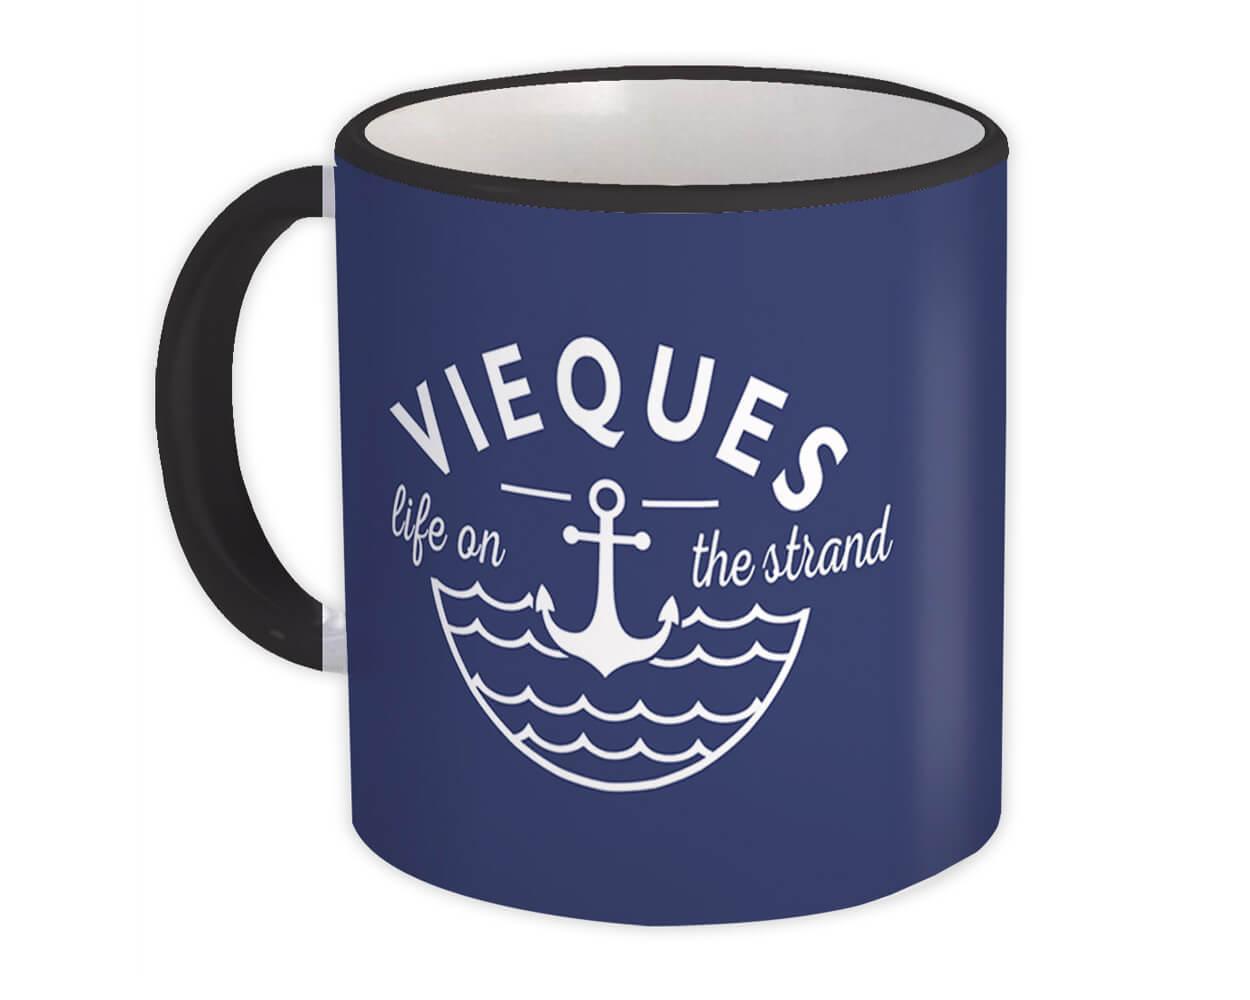 Vieques Life on the Strand : Gift Mug Beach Travel Souvenir Puerto Rico